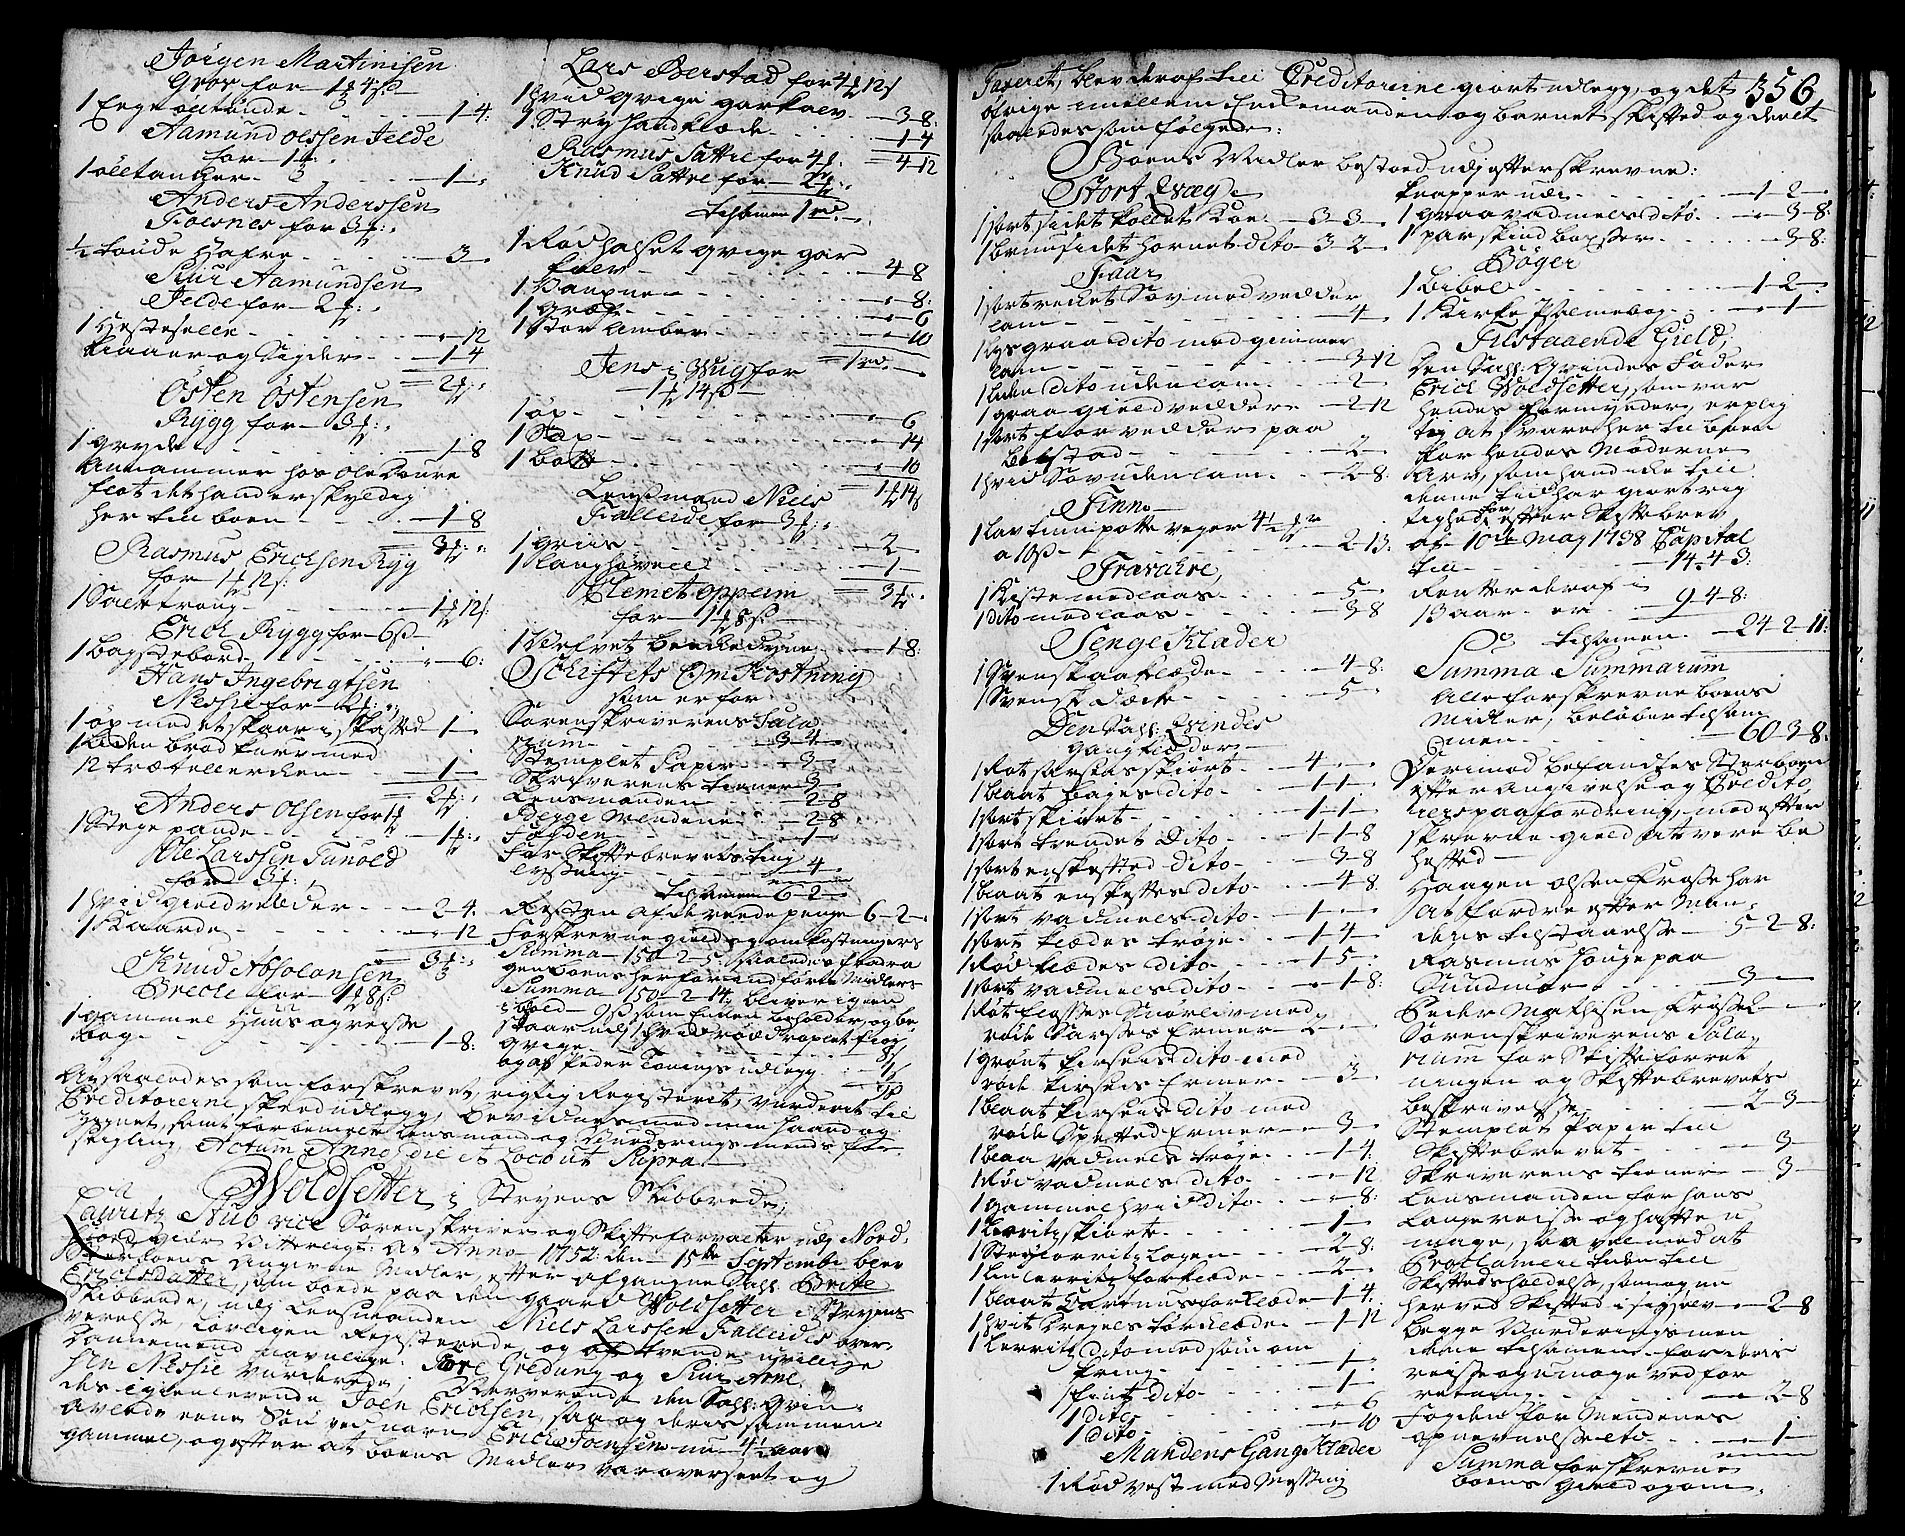 SAB, Nordfjord Sorenskriveri, 04/04a/L0011: Skifteprotokollar, 1750-1753, s. 355b-356a